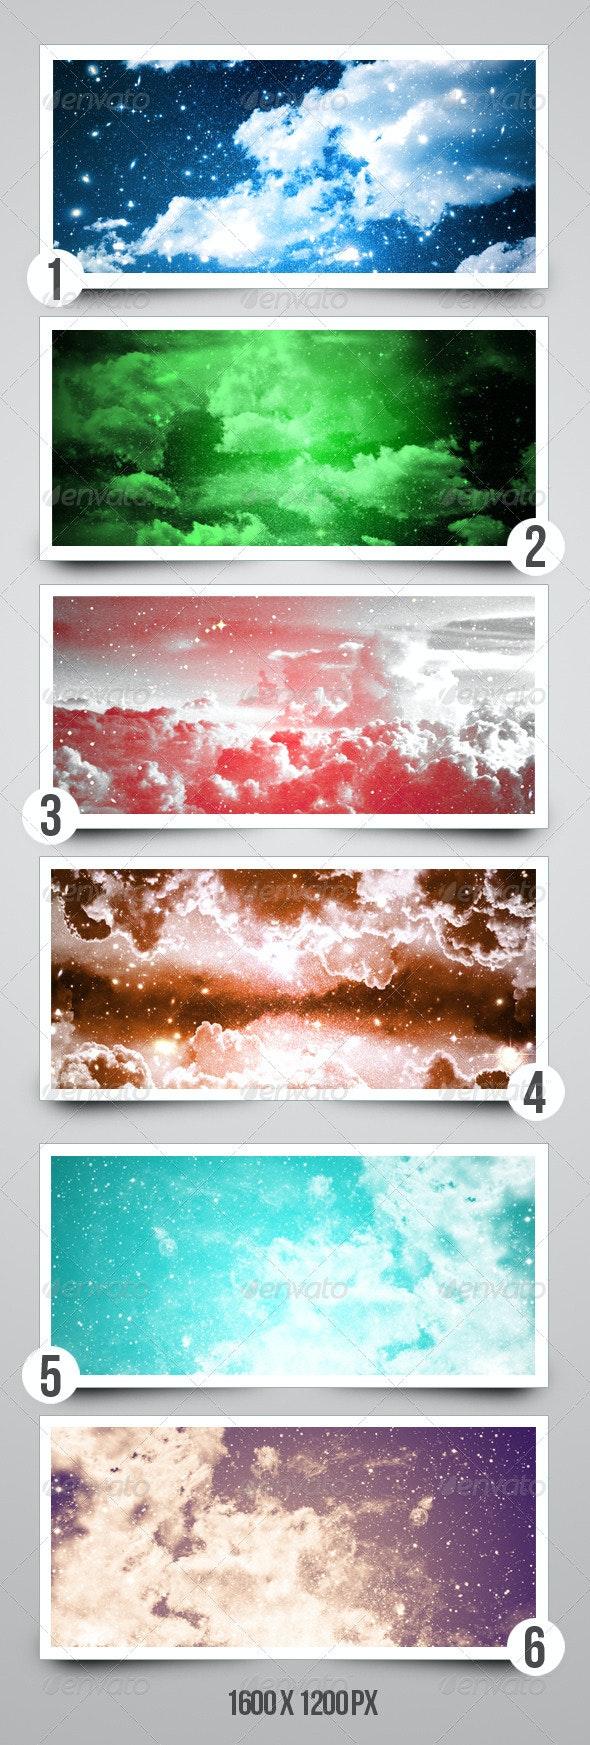 Fantasy Cloud Background Texture - Space / Celestial Textures